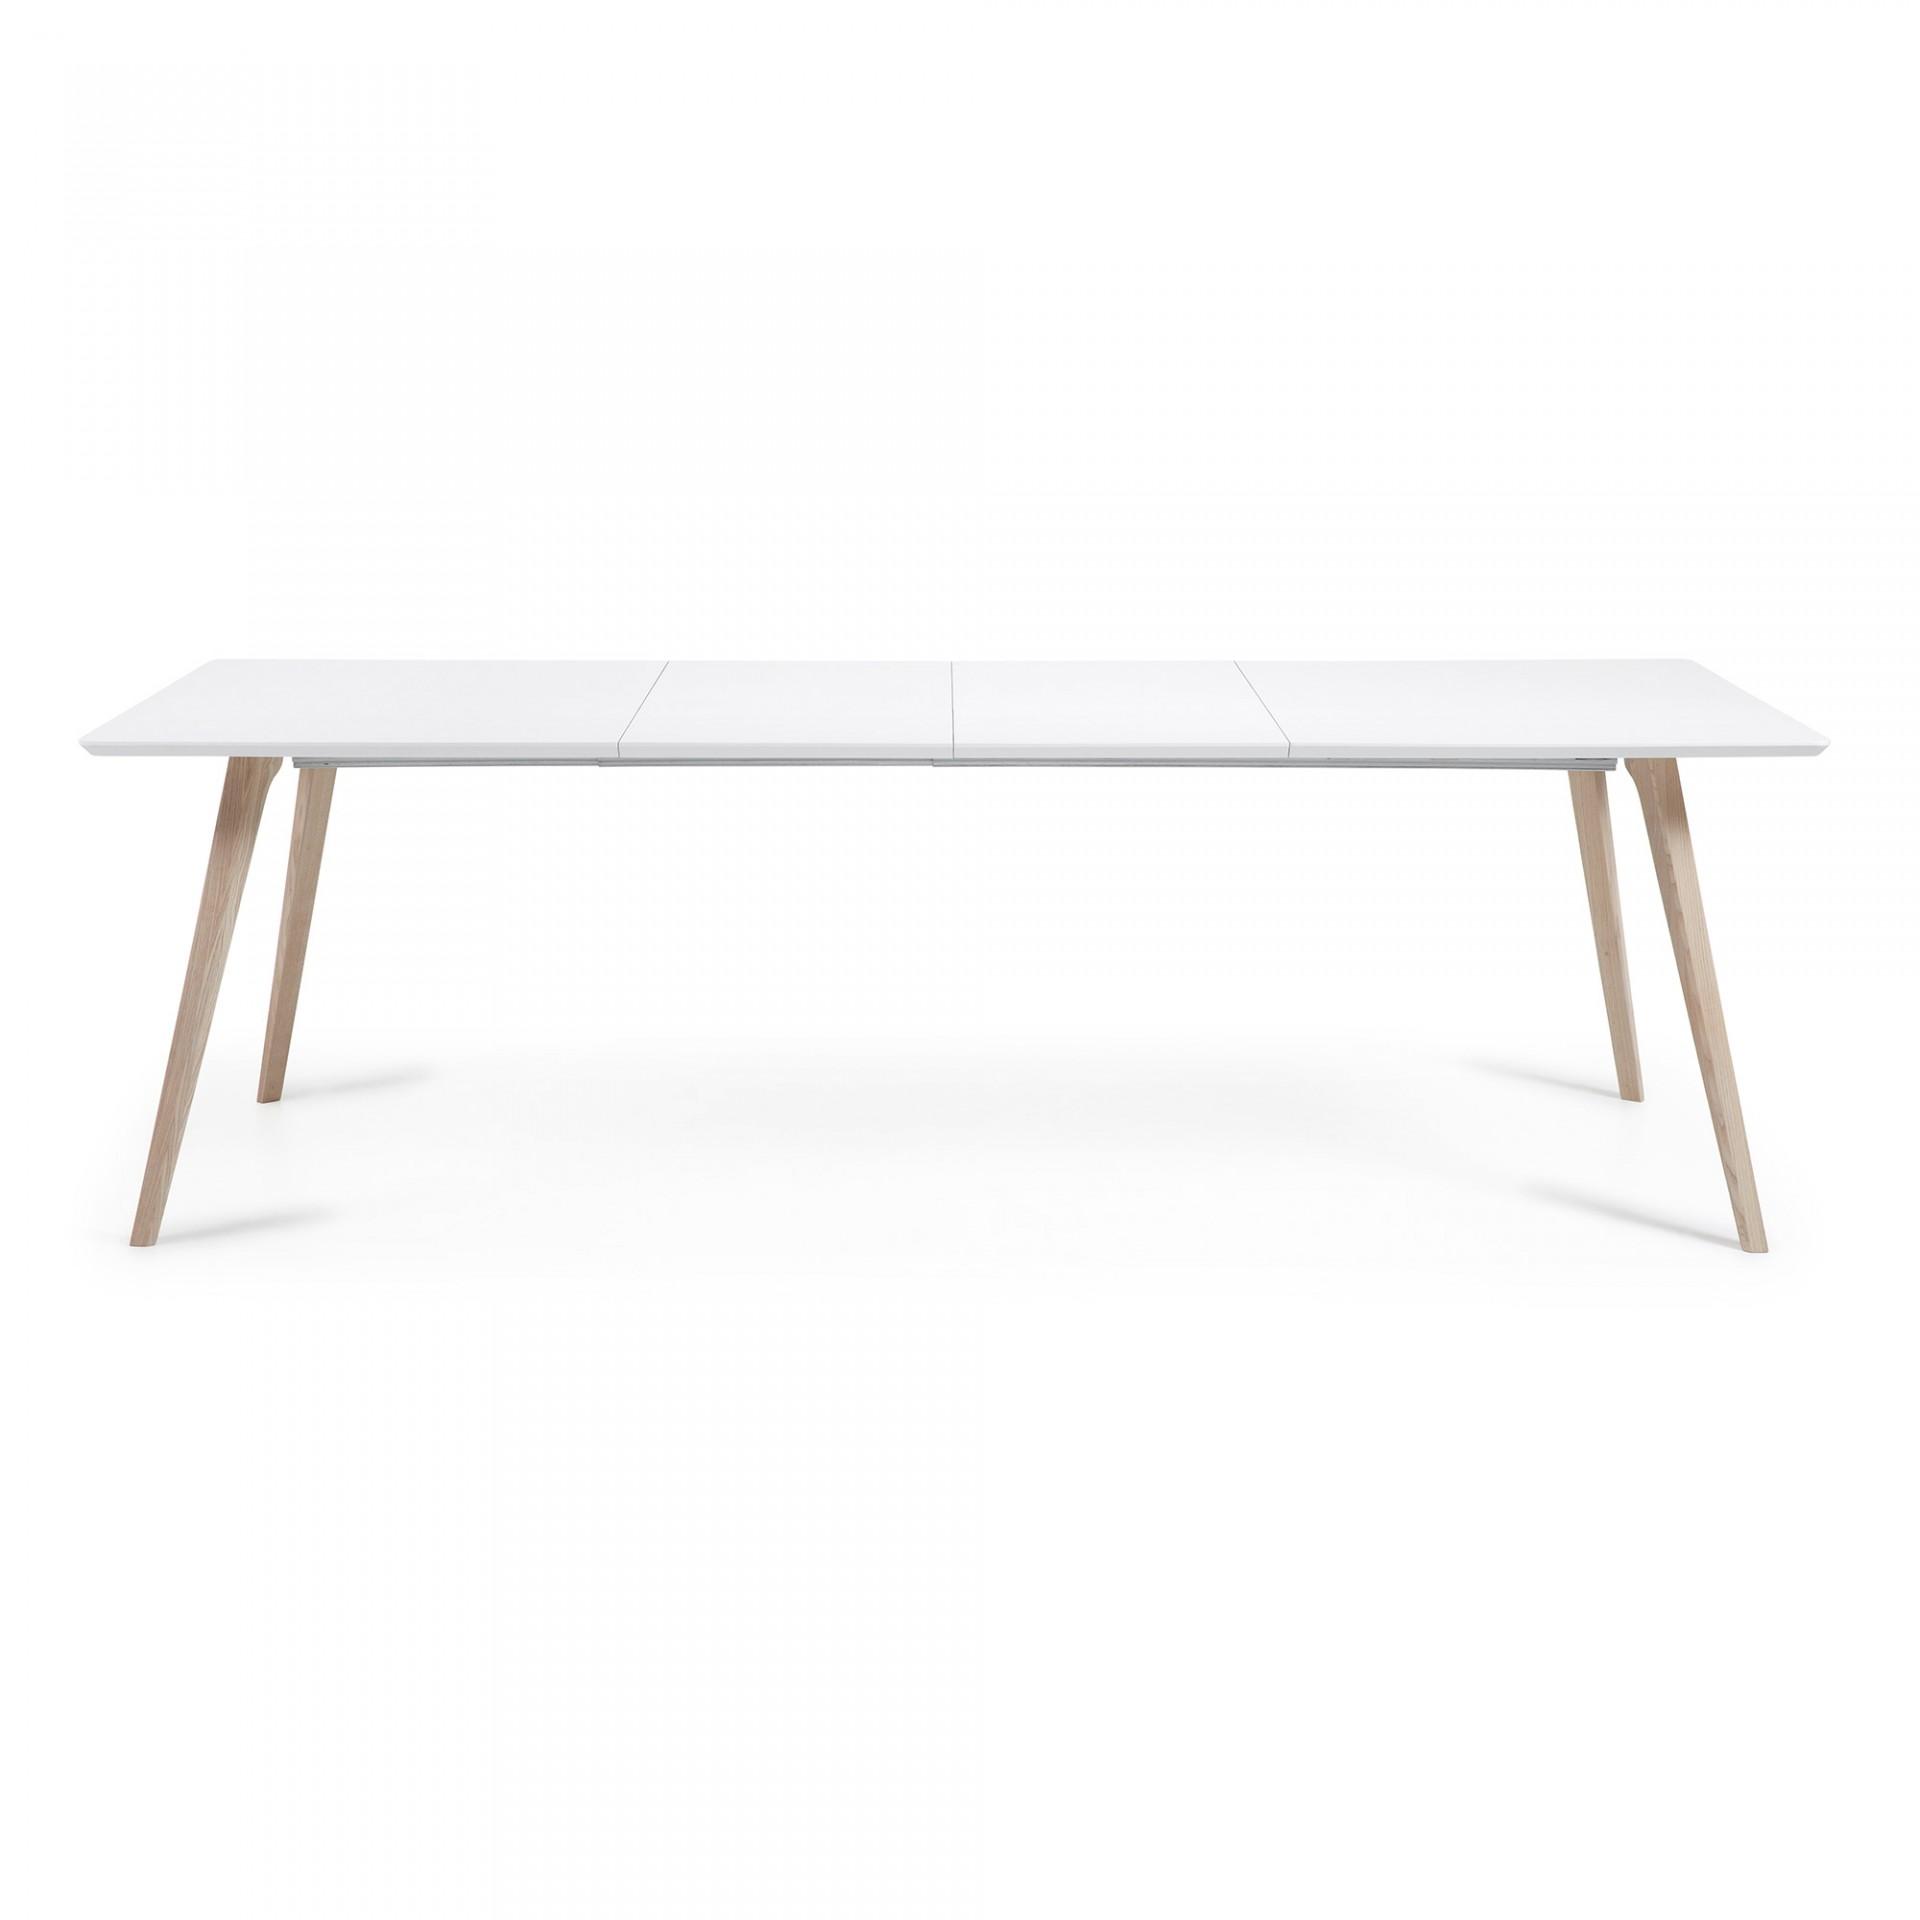 Mesa extensível Emmi, madeira de freixo/MDF lacado